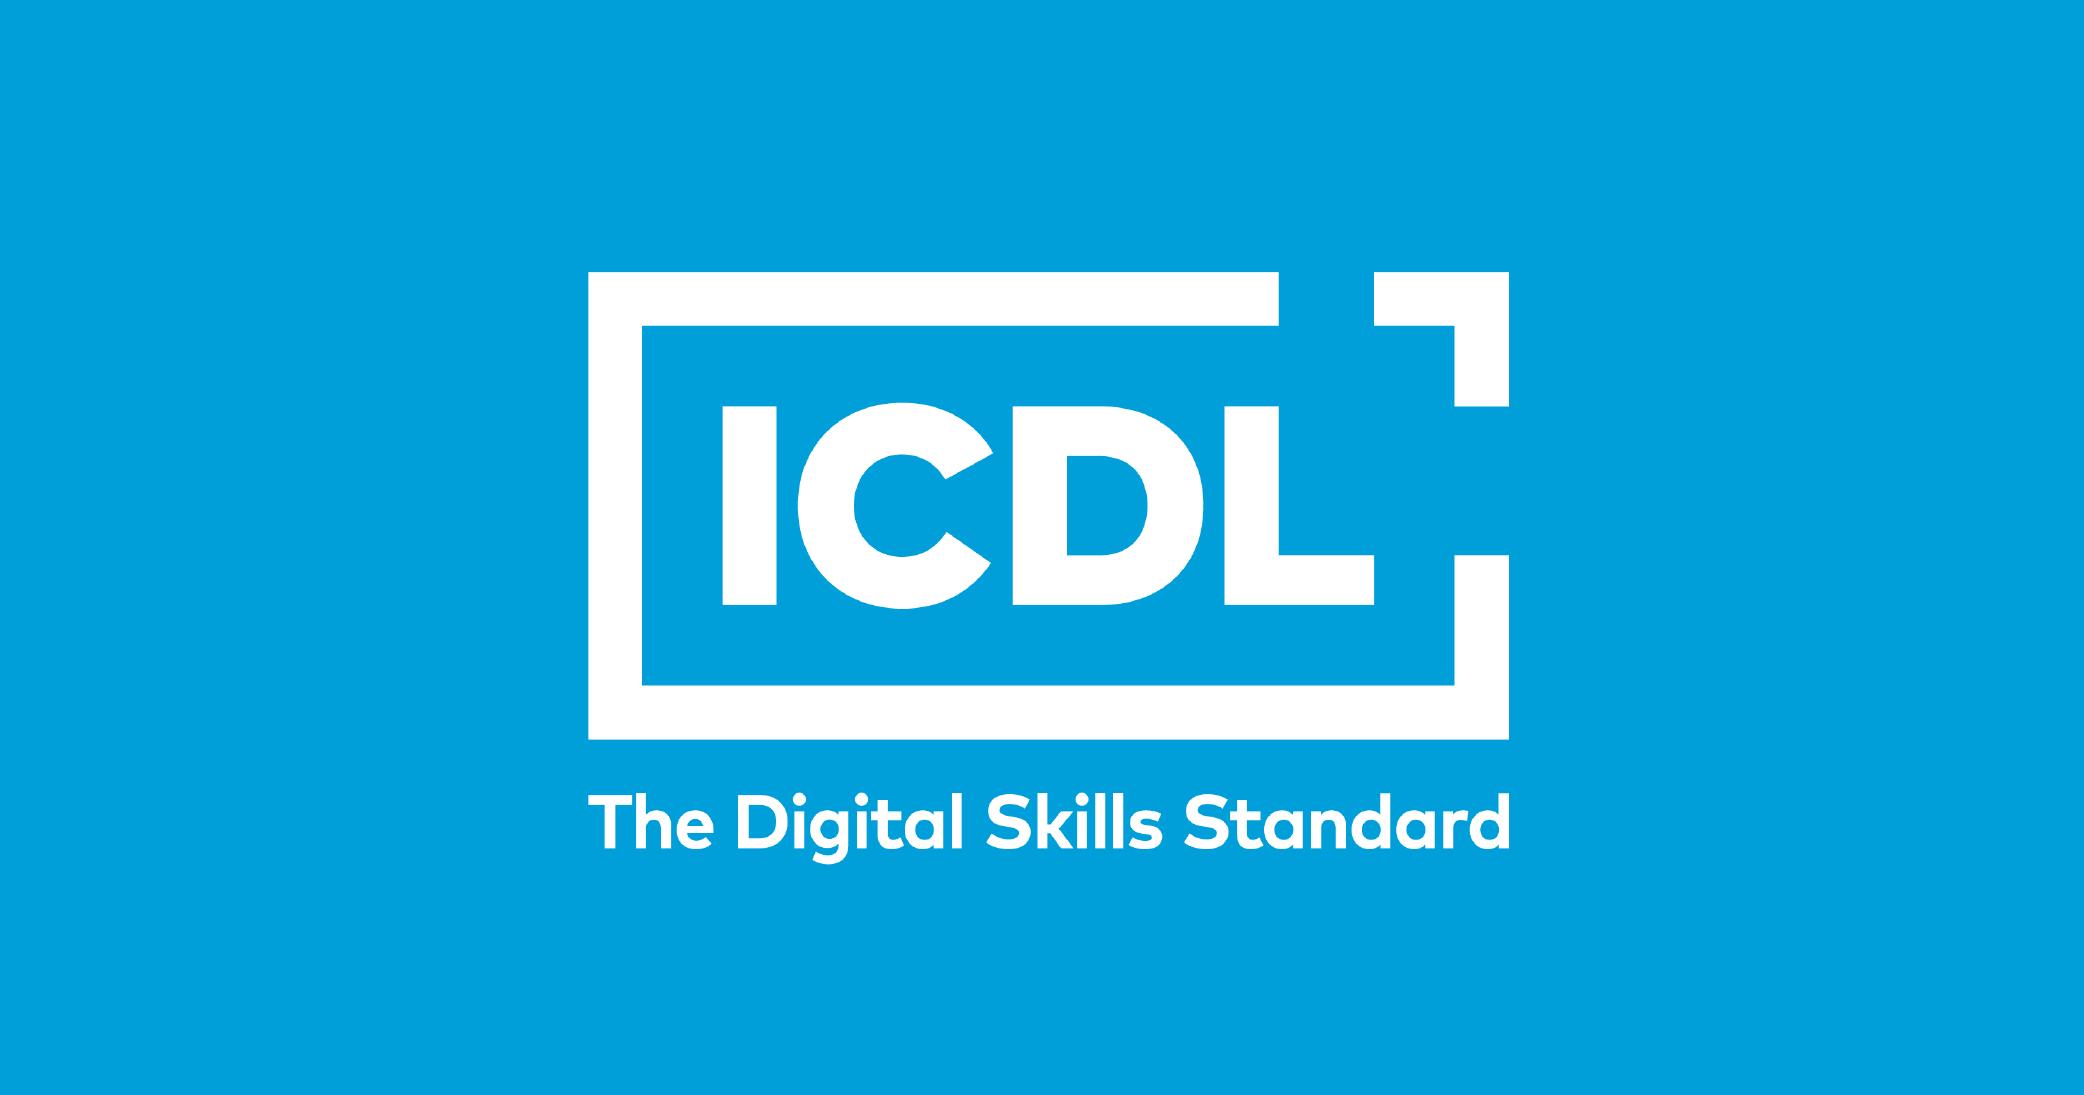 sfondo azzurro - logo ICDL